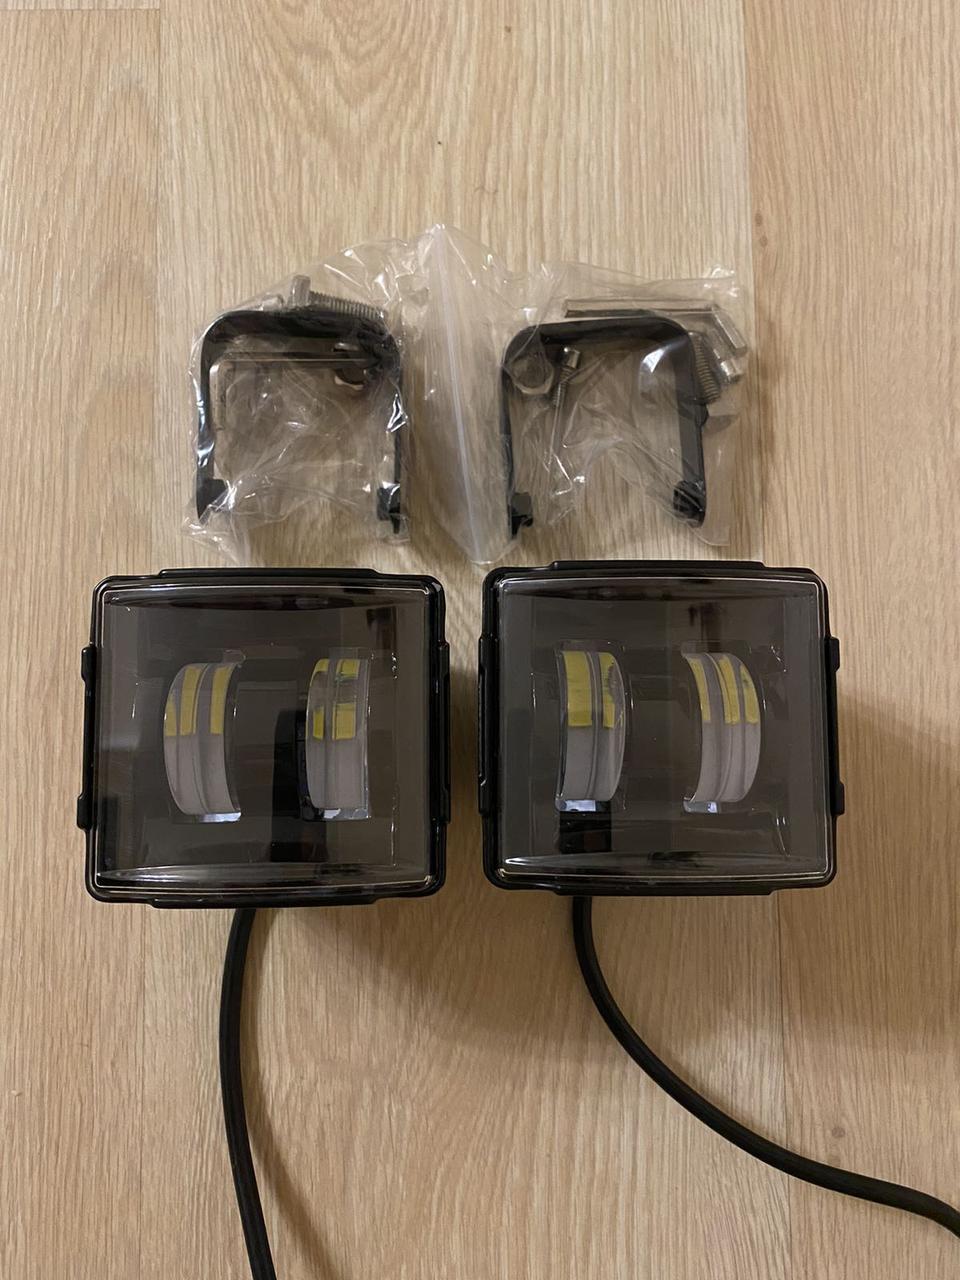 Самые яркие LED фары 30W СТГ противотуманные фары лэд фара диодные